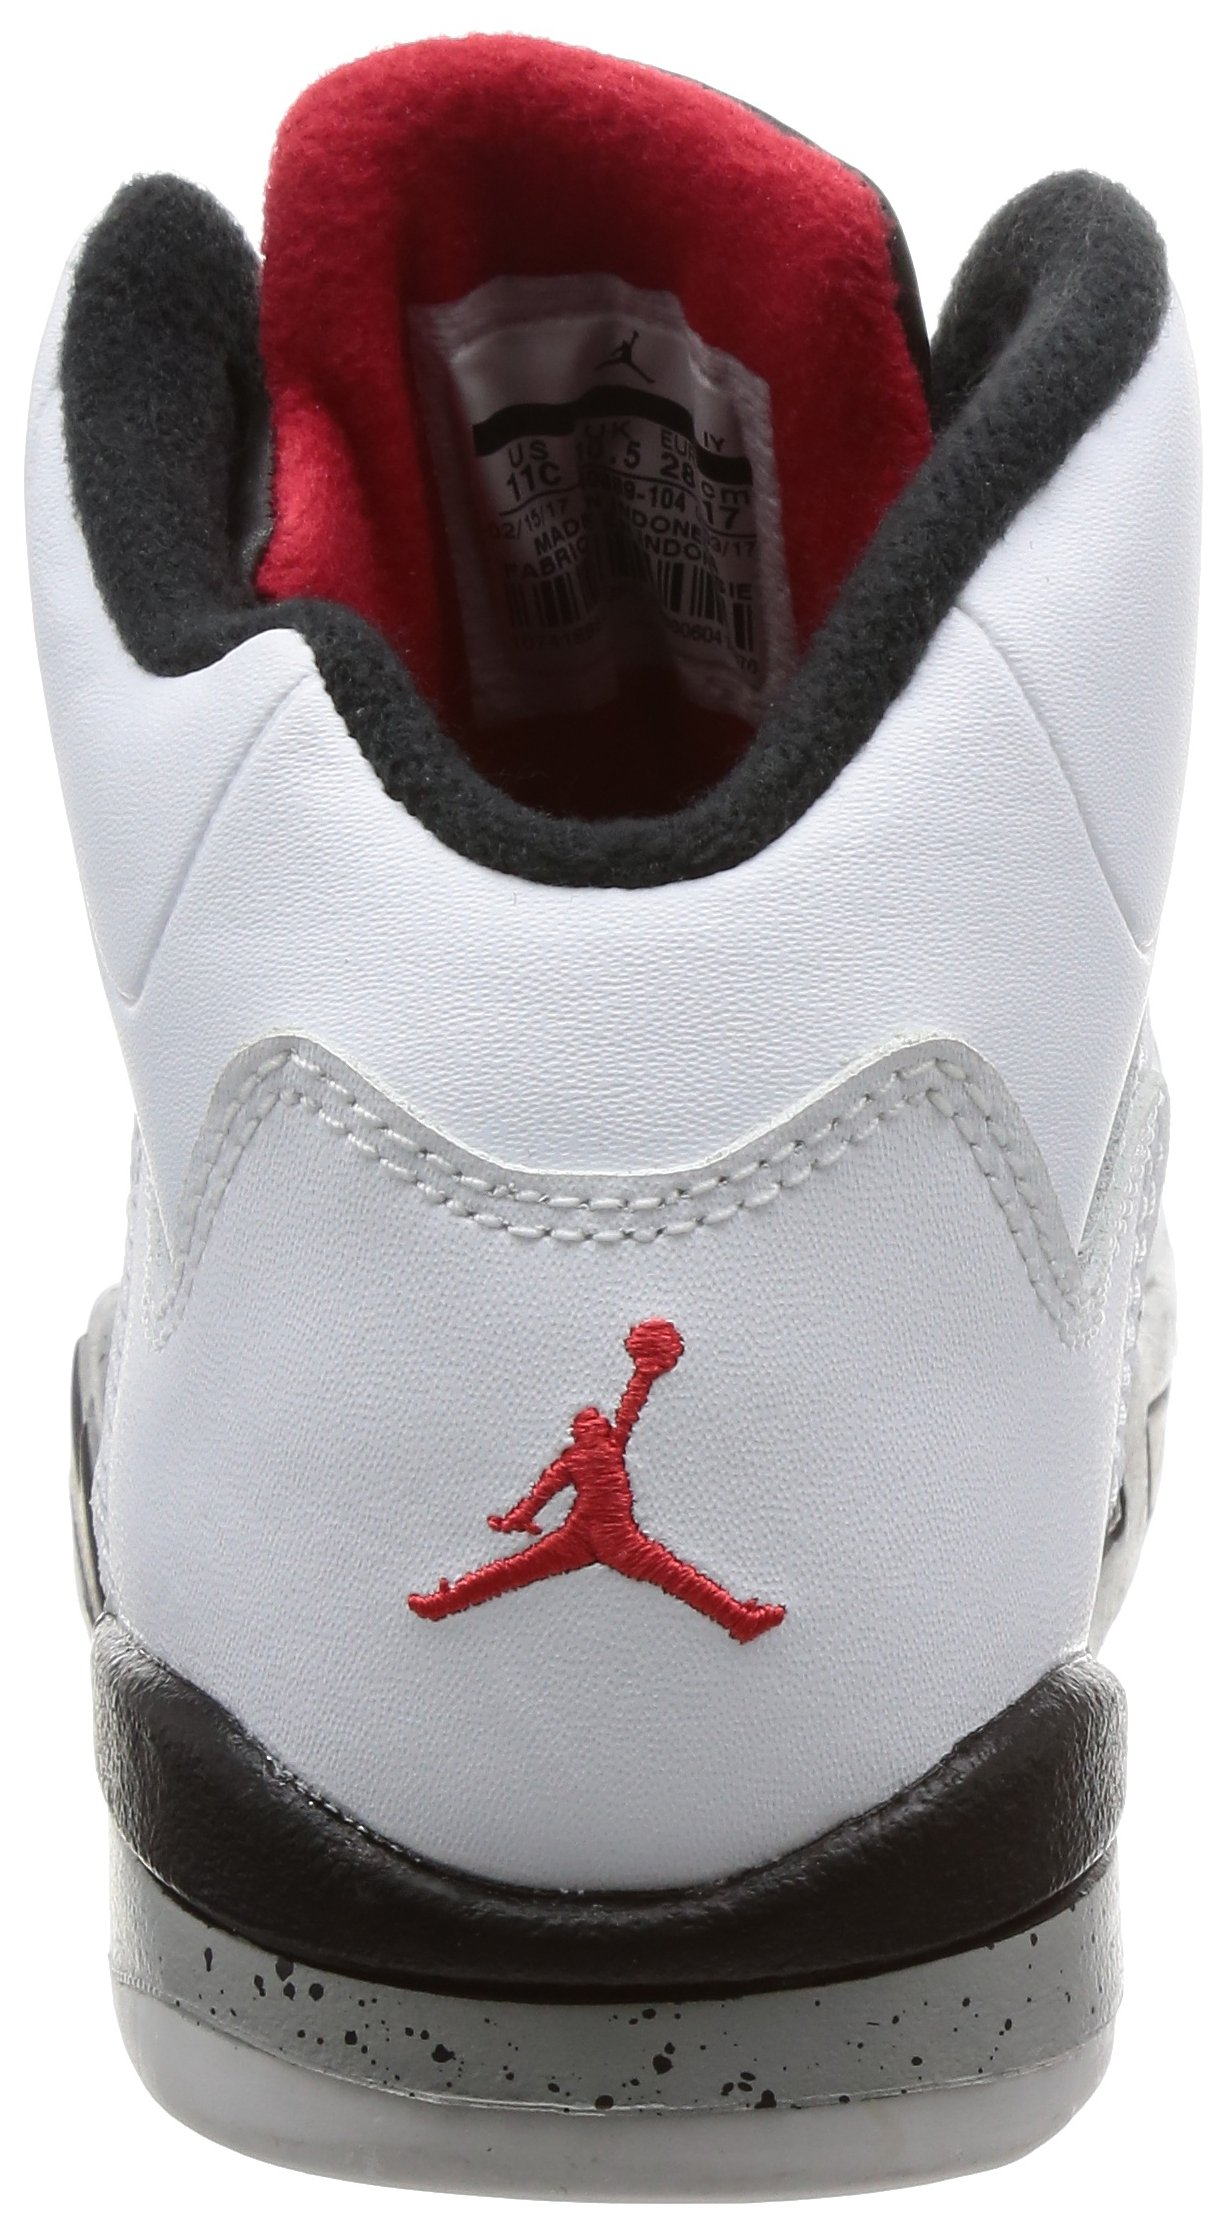 lowest price 1e5f4 b15e0 Jordan Retro 5